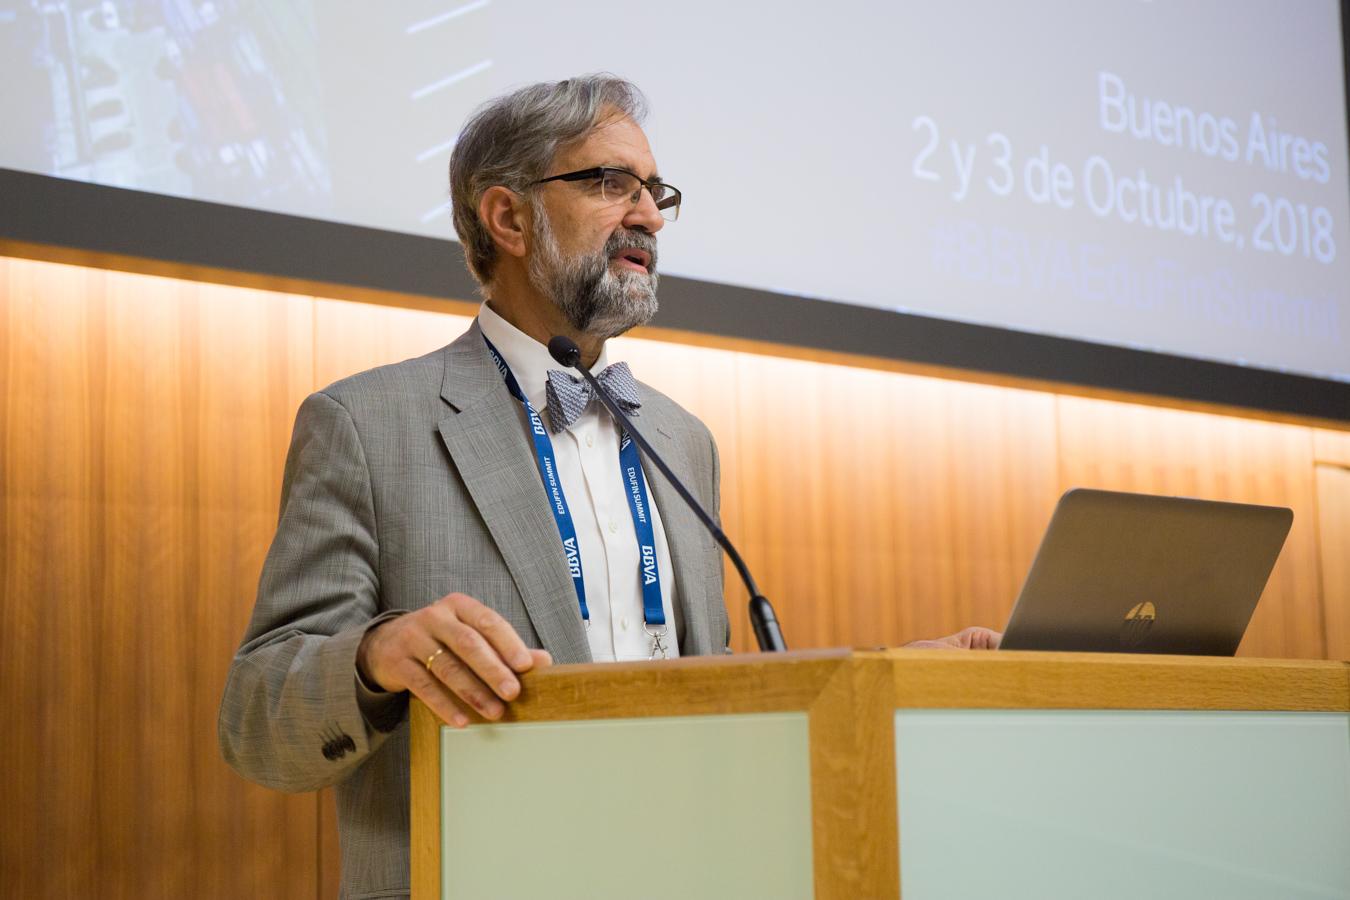 José Antonio Herce, Associate Director at International Financial Analysts (AFI)